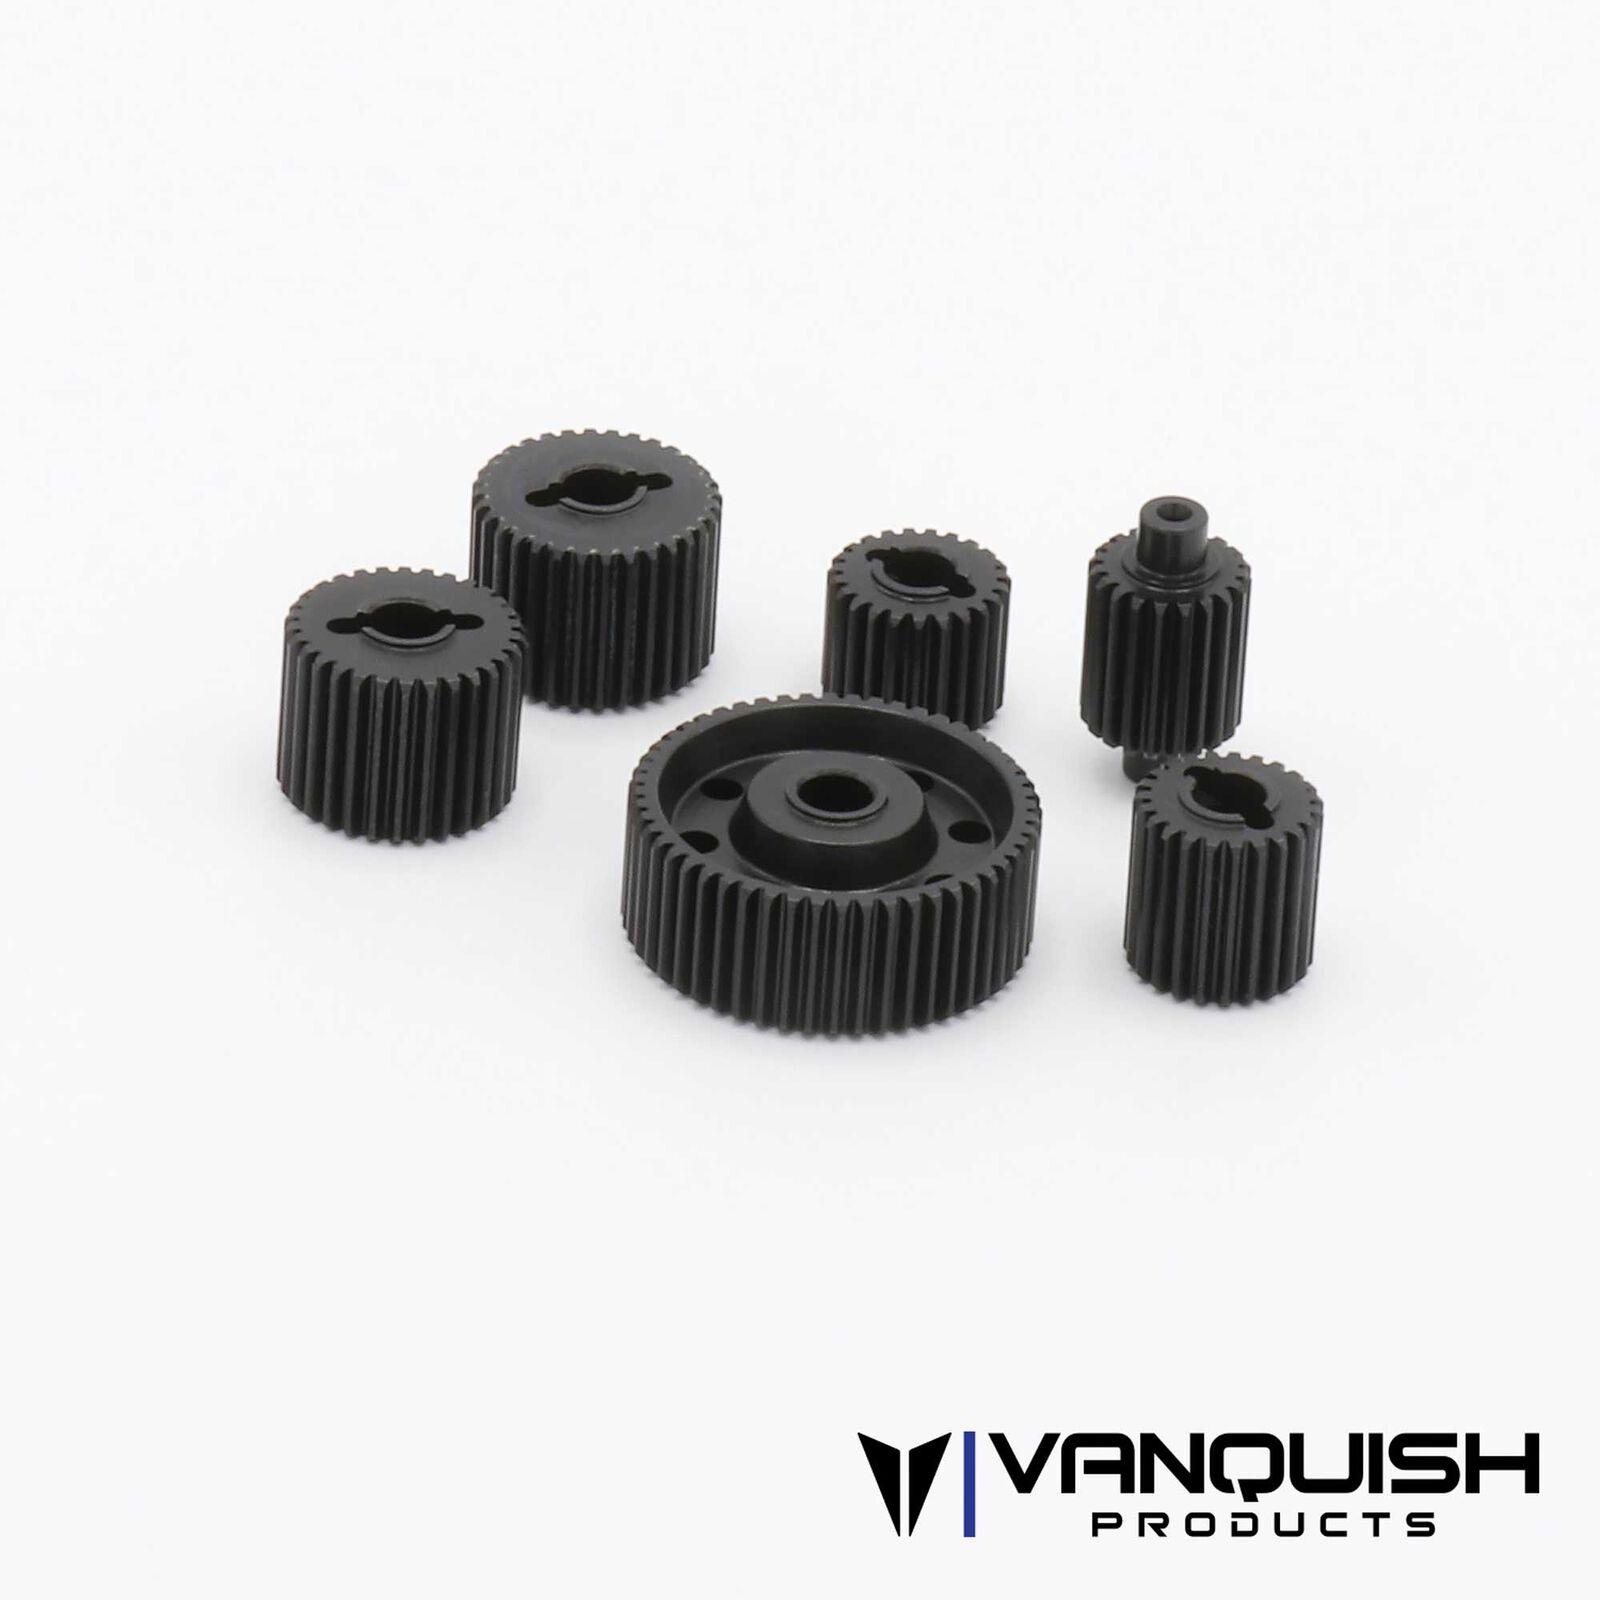 VFD Machined Gear Set